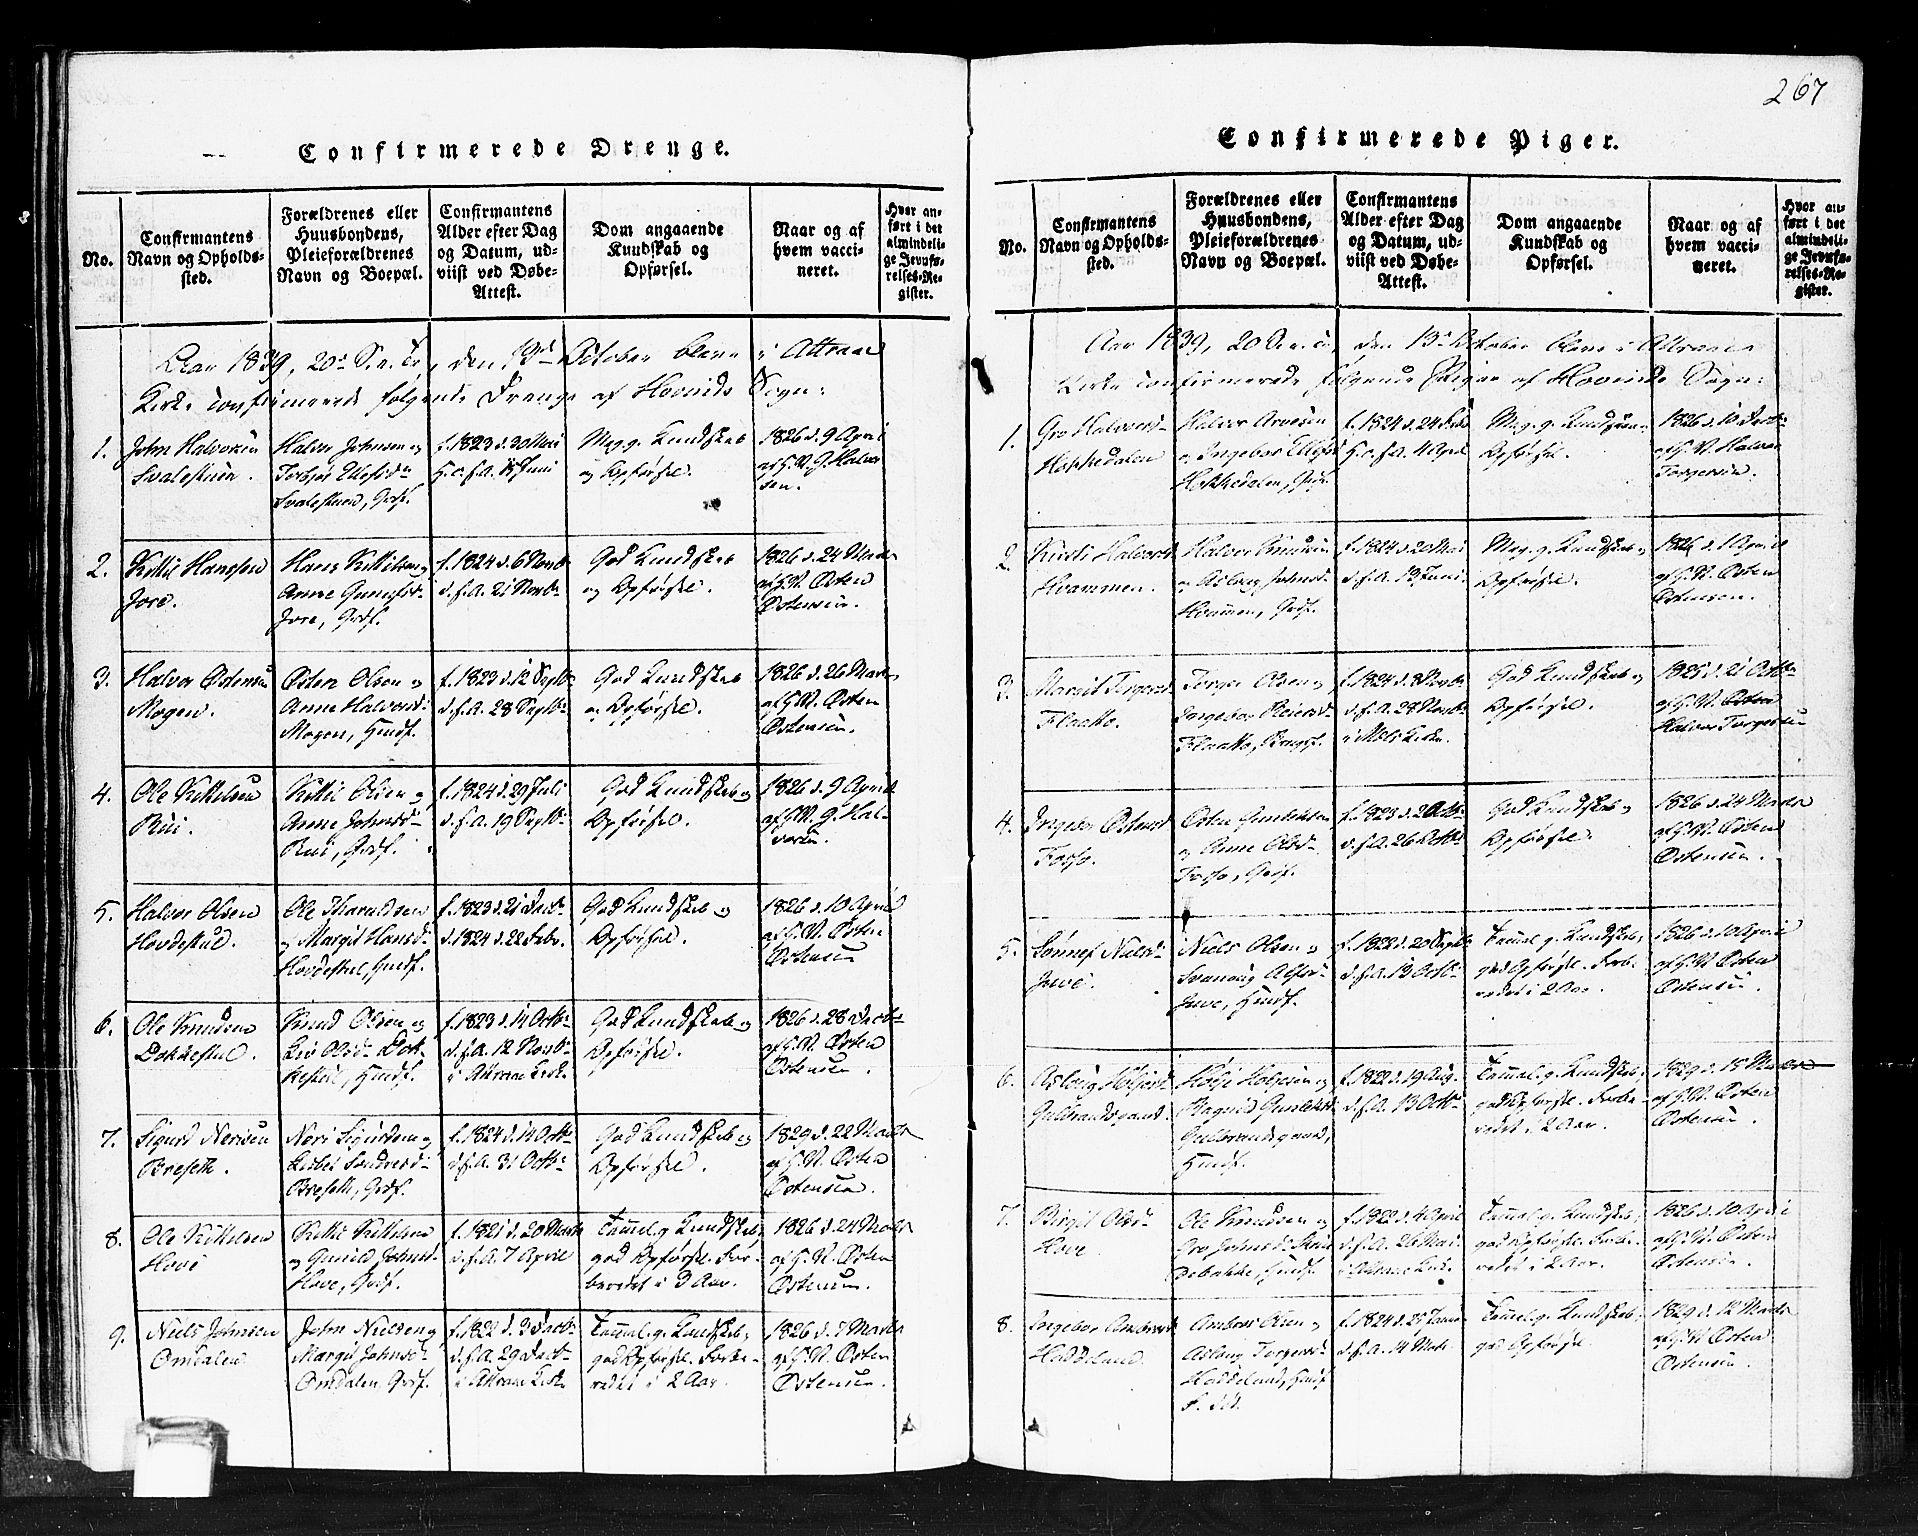 SAKO, Gransherad kirkebøker, F/Fb/L0002: Ministerialbok nr. II 2, 1815-1843, s. 267